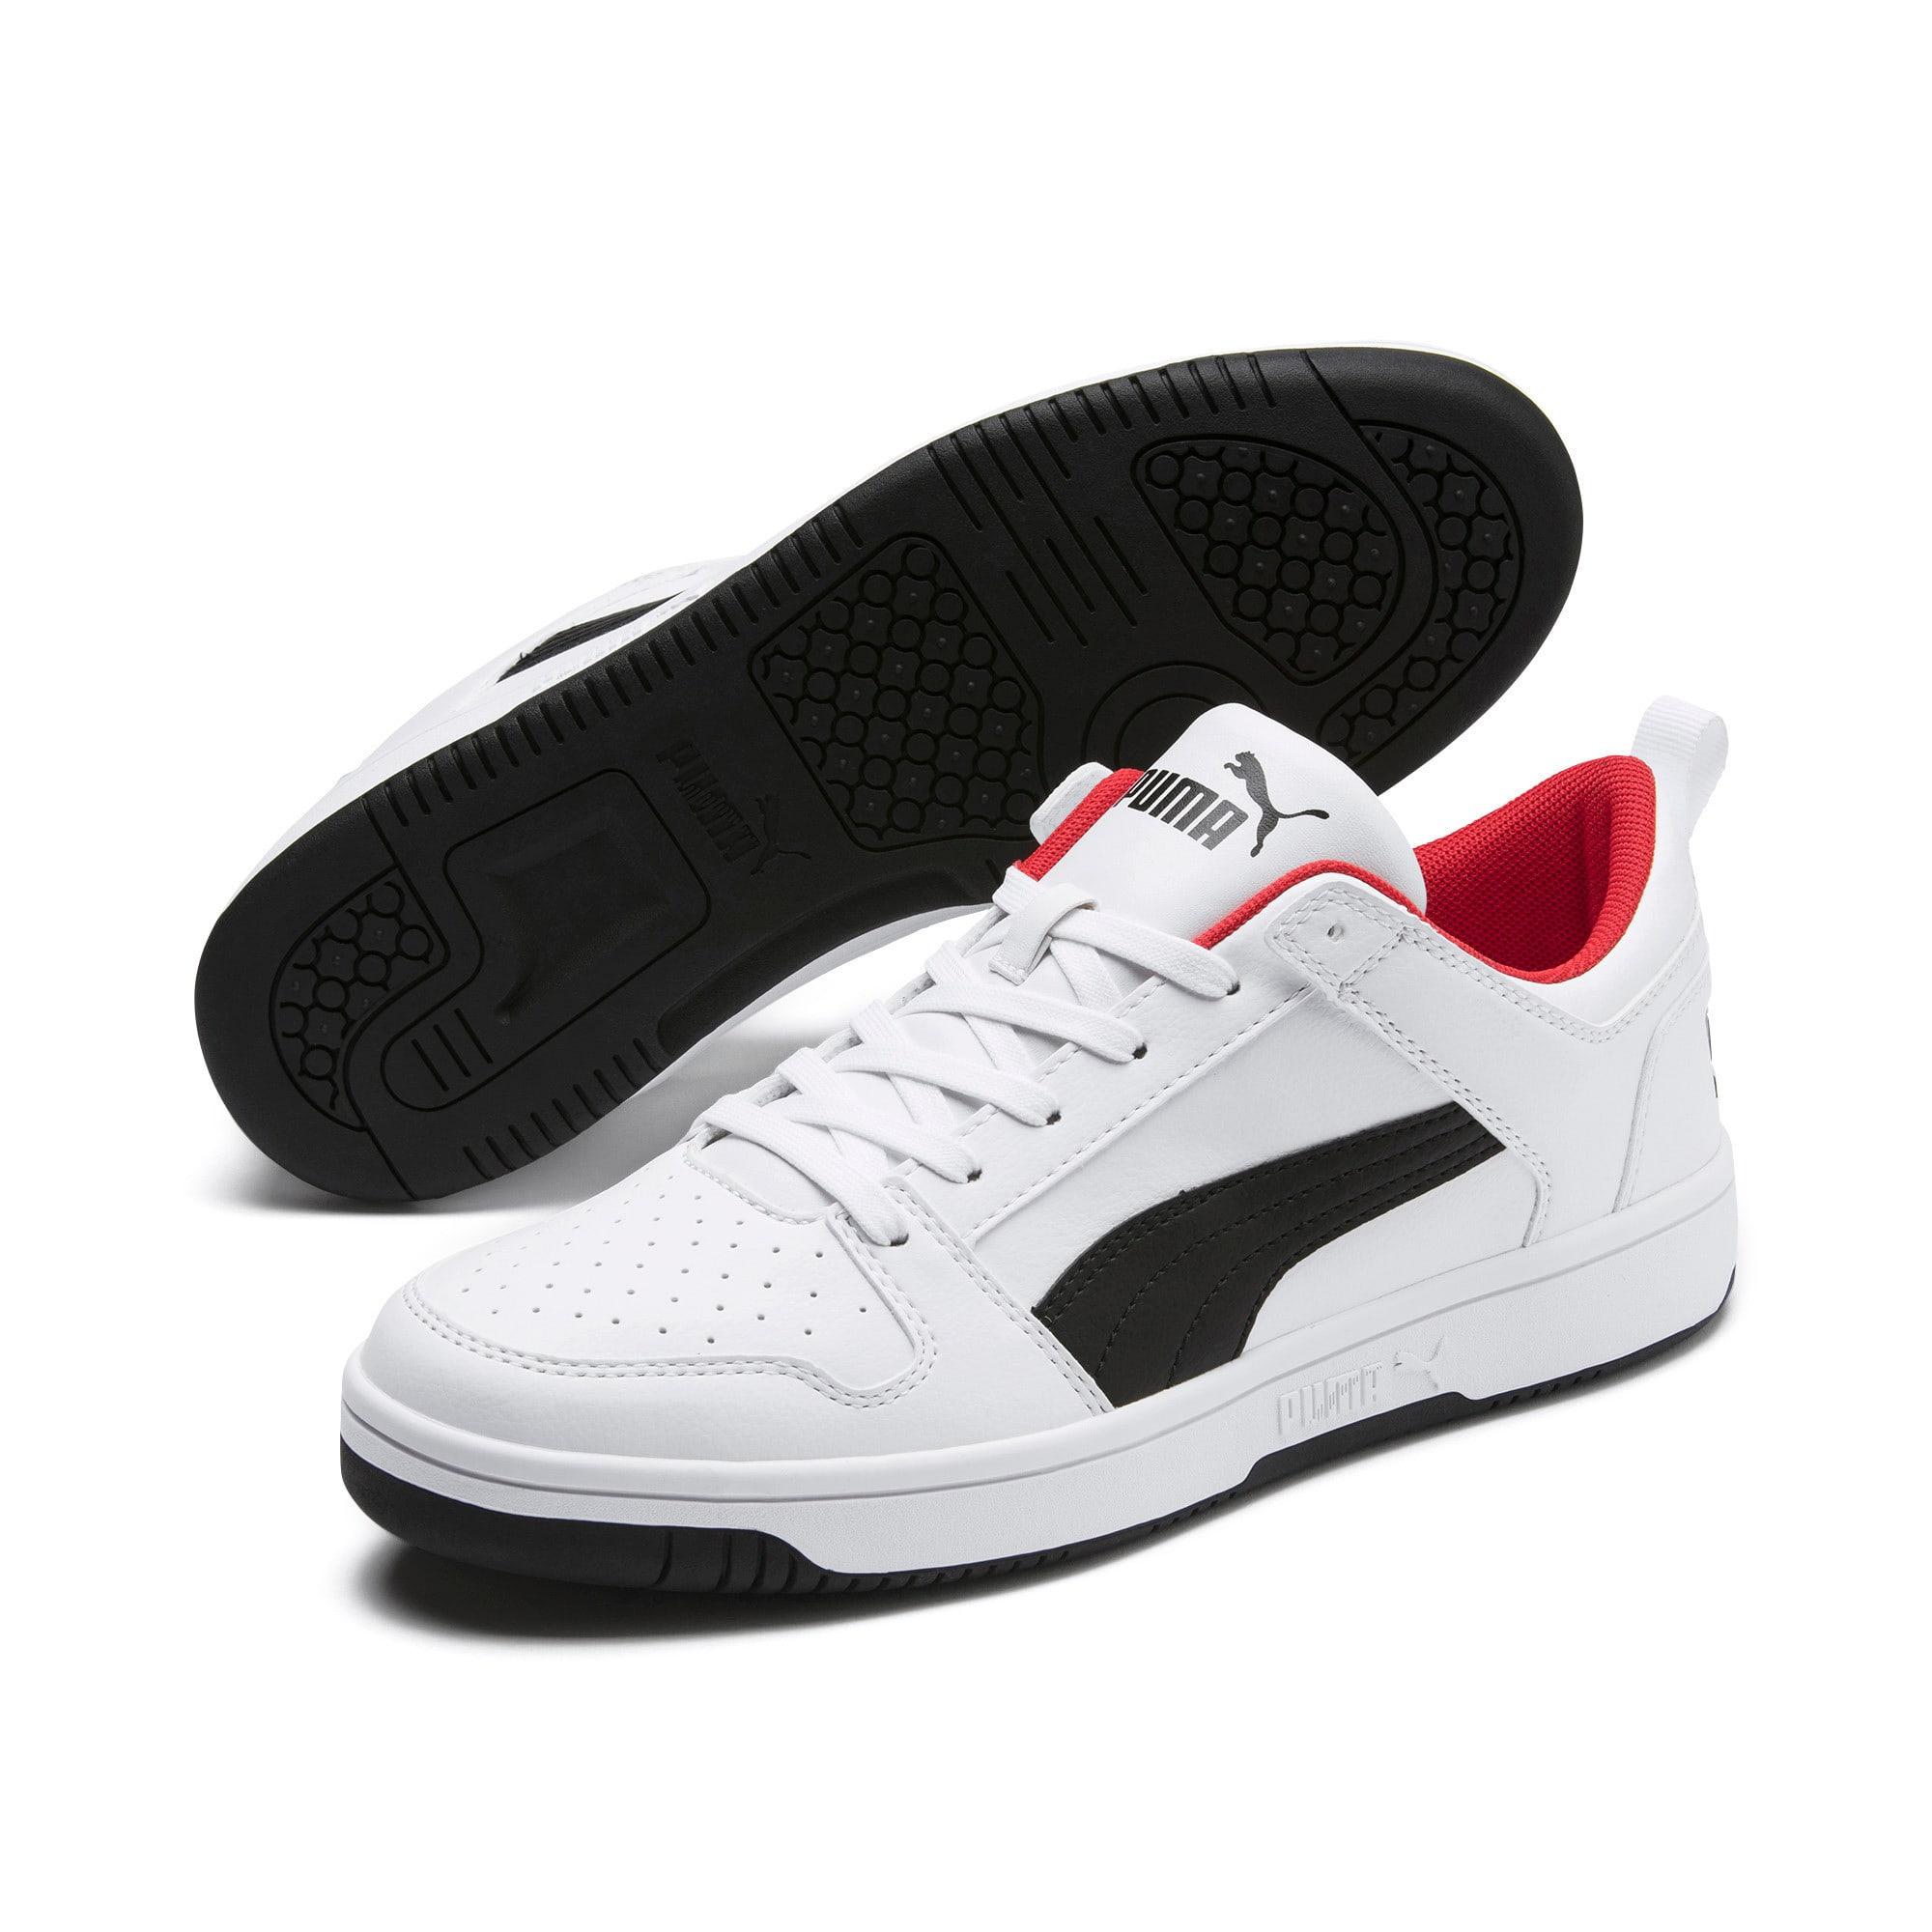 Miniatura 3 de Zapatos deportivos PUMA Rebound LayUp Lo, White-Black-High Risk Red, mediano